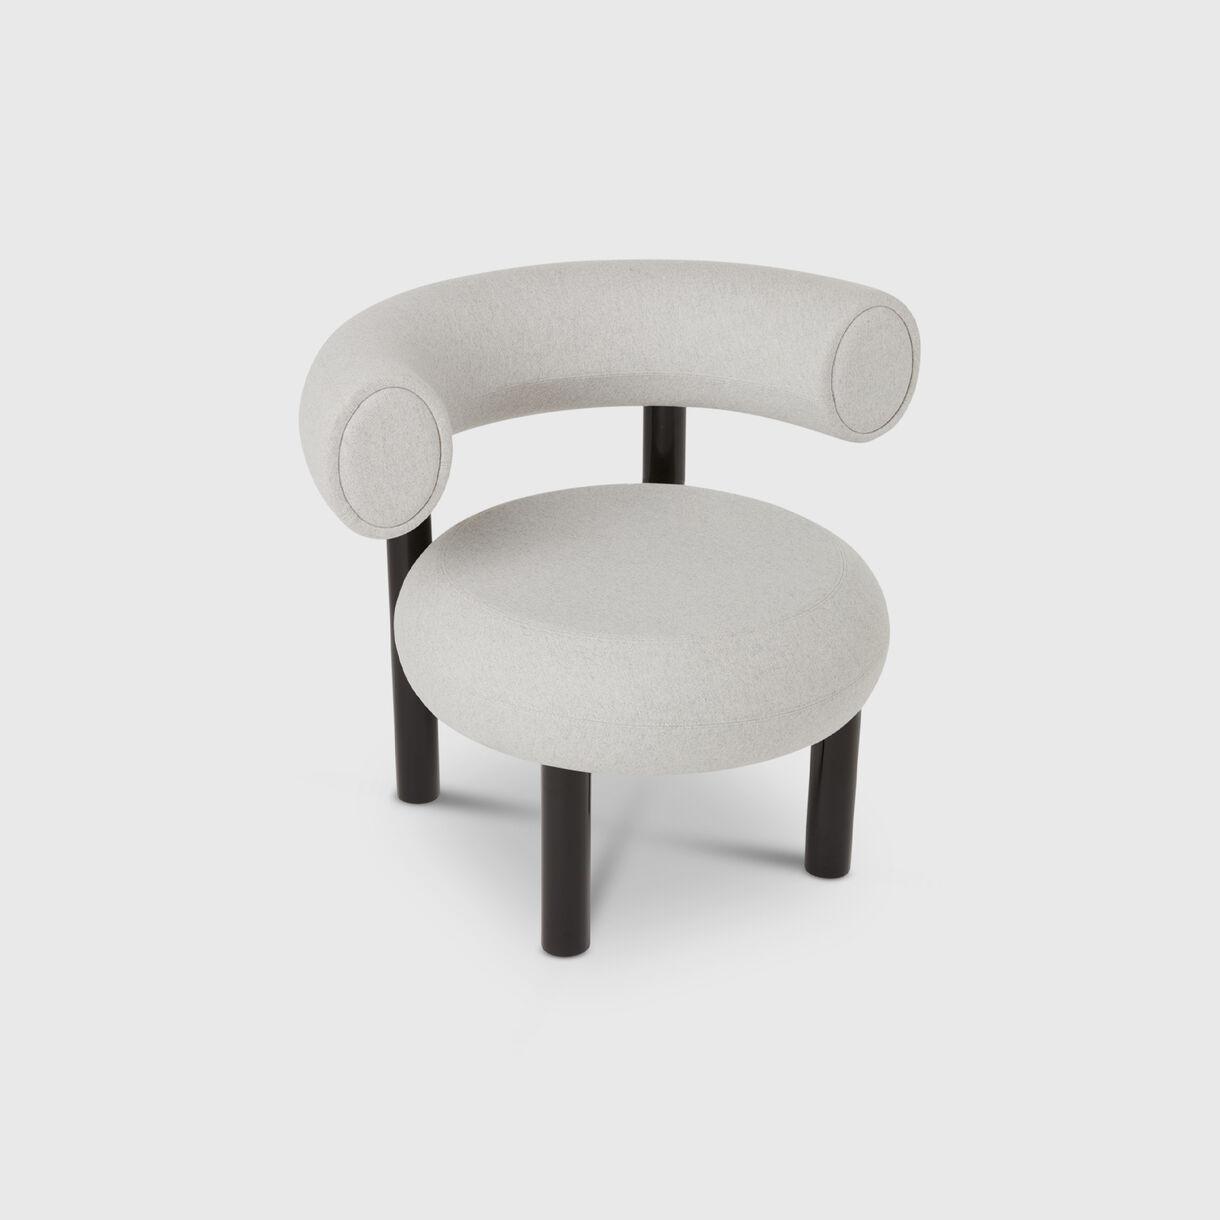 Fat Lounge Chair, Mollie Melton 0103